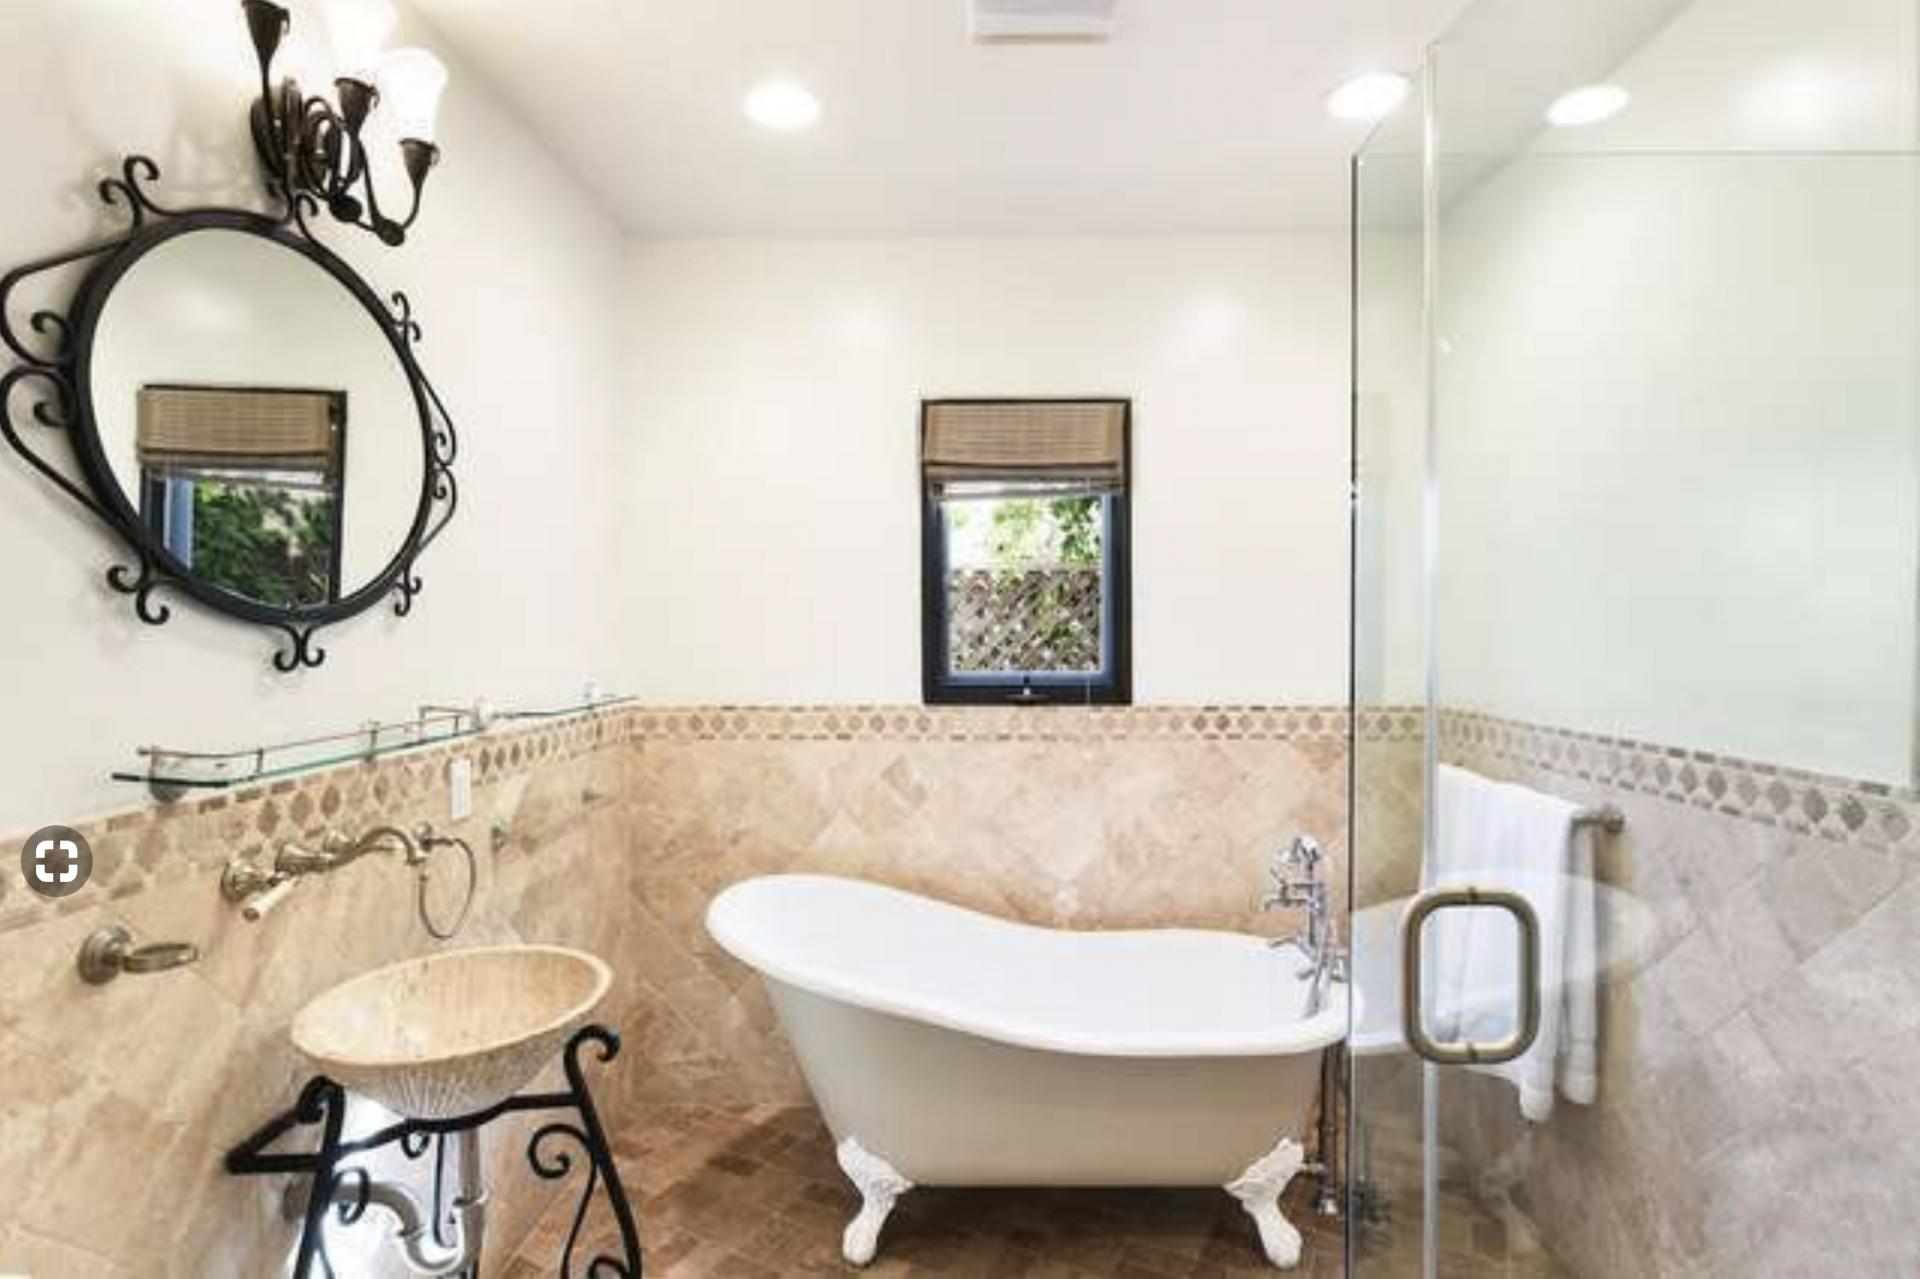 Bathroom Remodeling | Aldan Construction and Remodeling